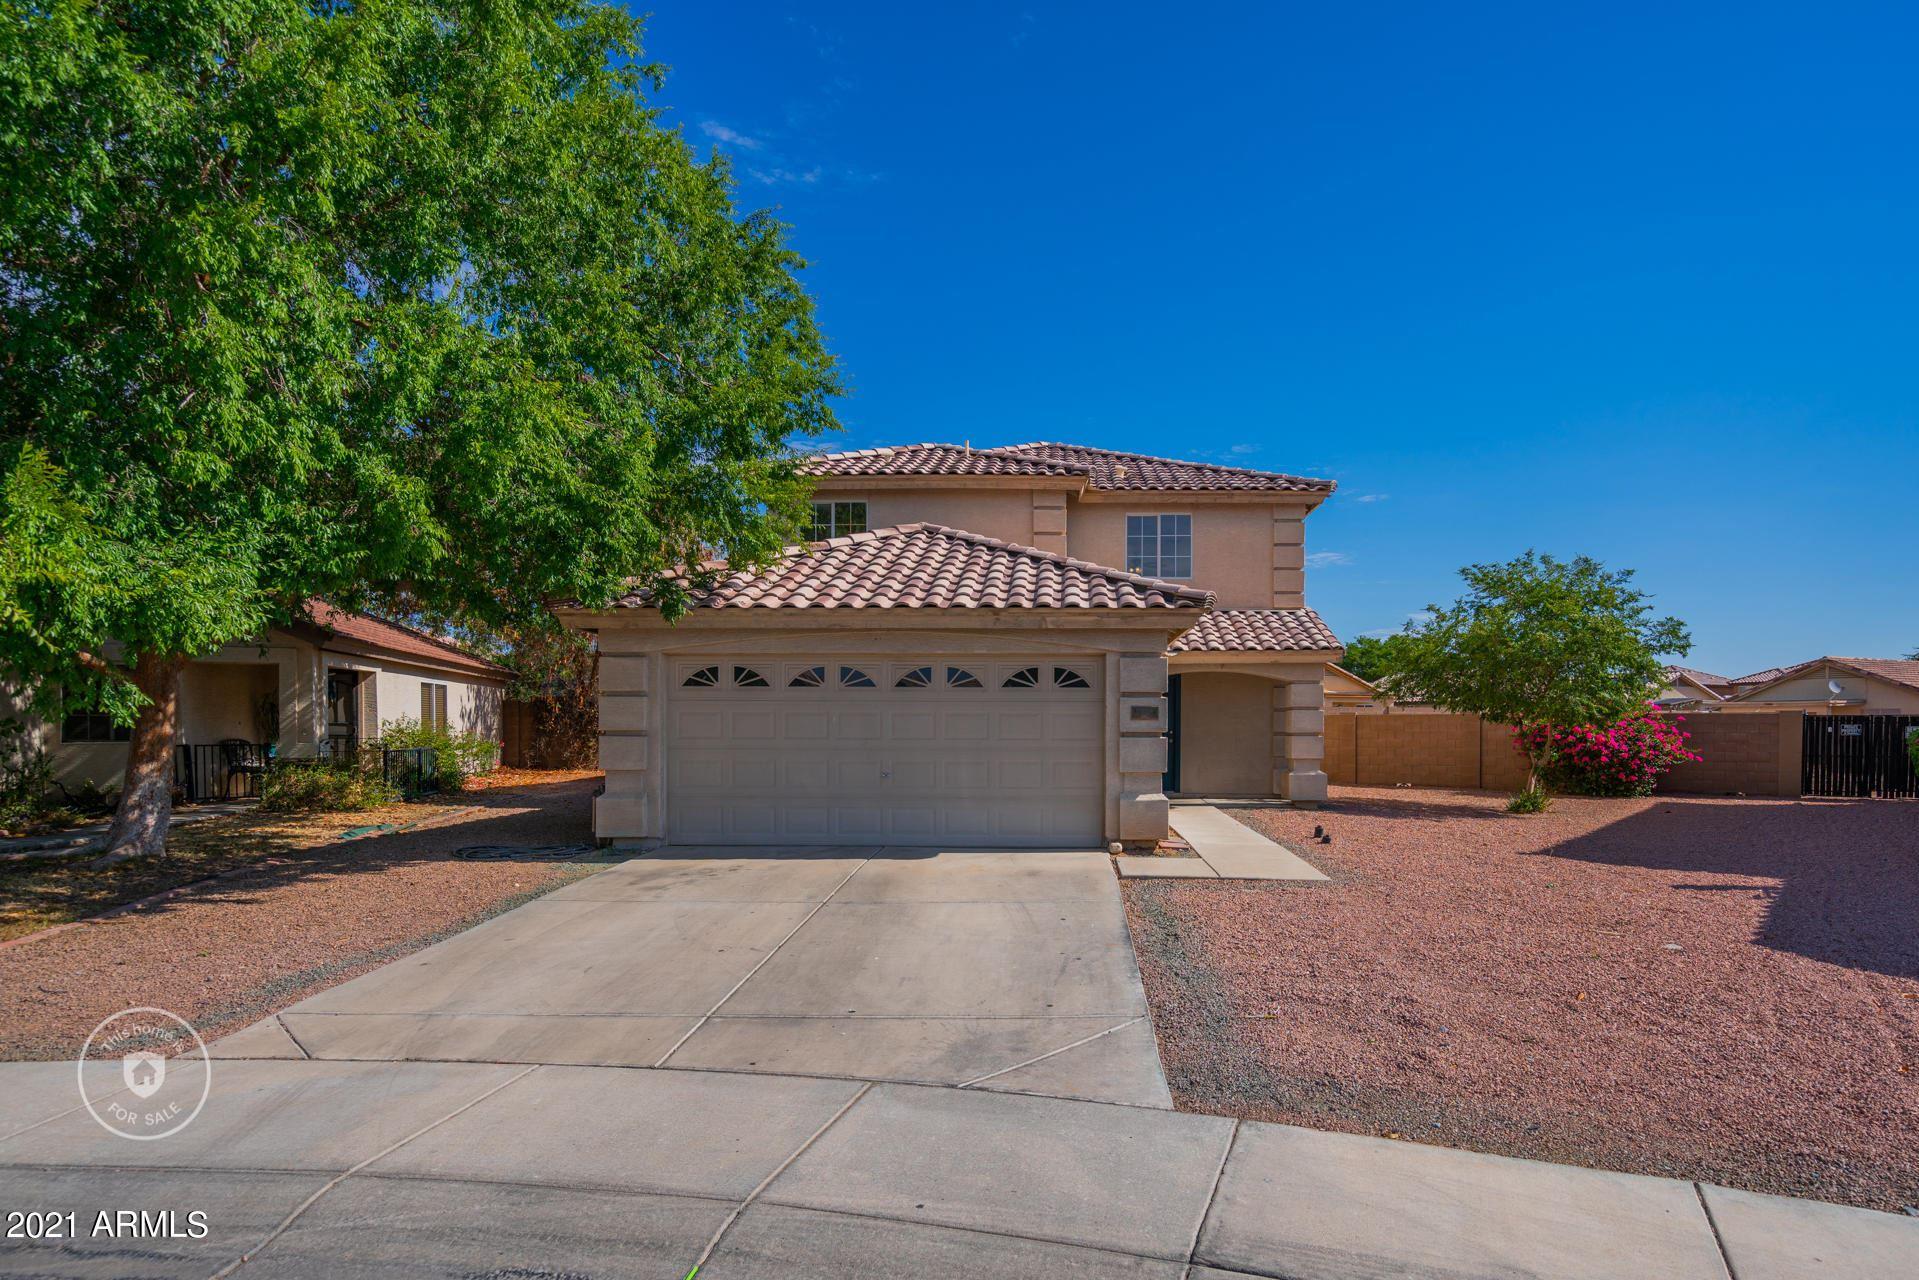 Photo of 12130 W CORRINE Drive, El Mirage, AZ 85335 (MLS # 6262761)